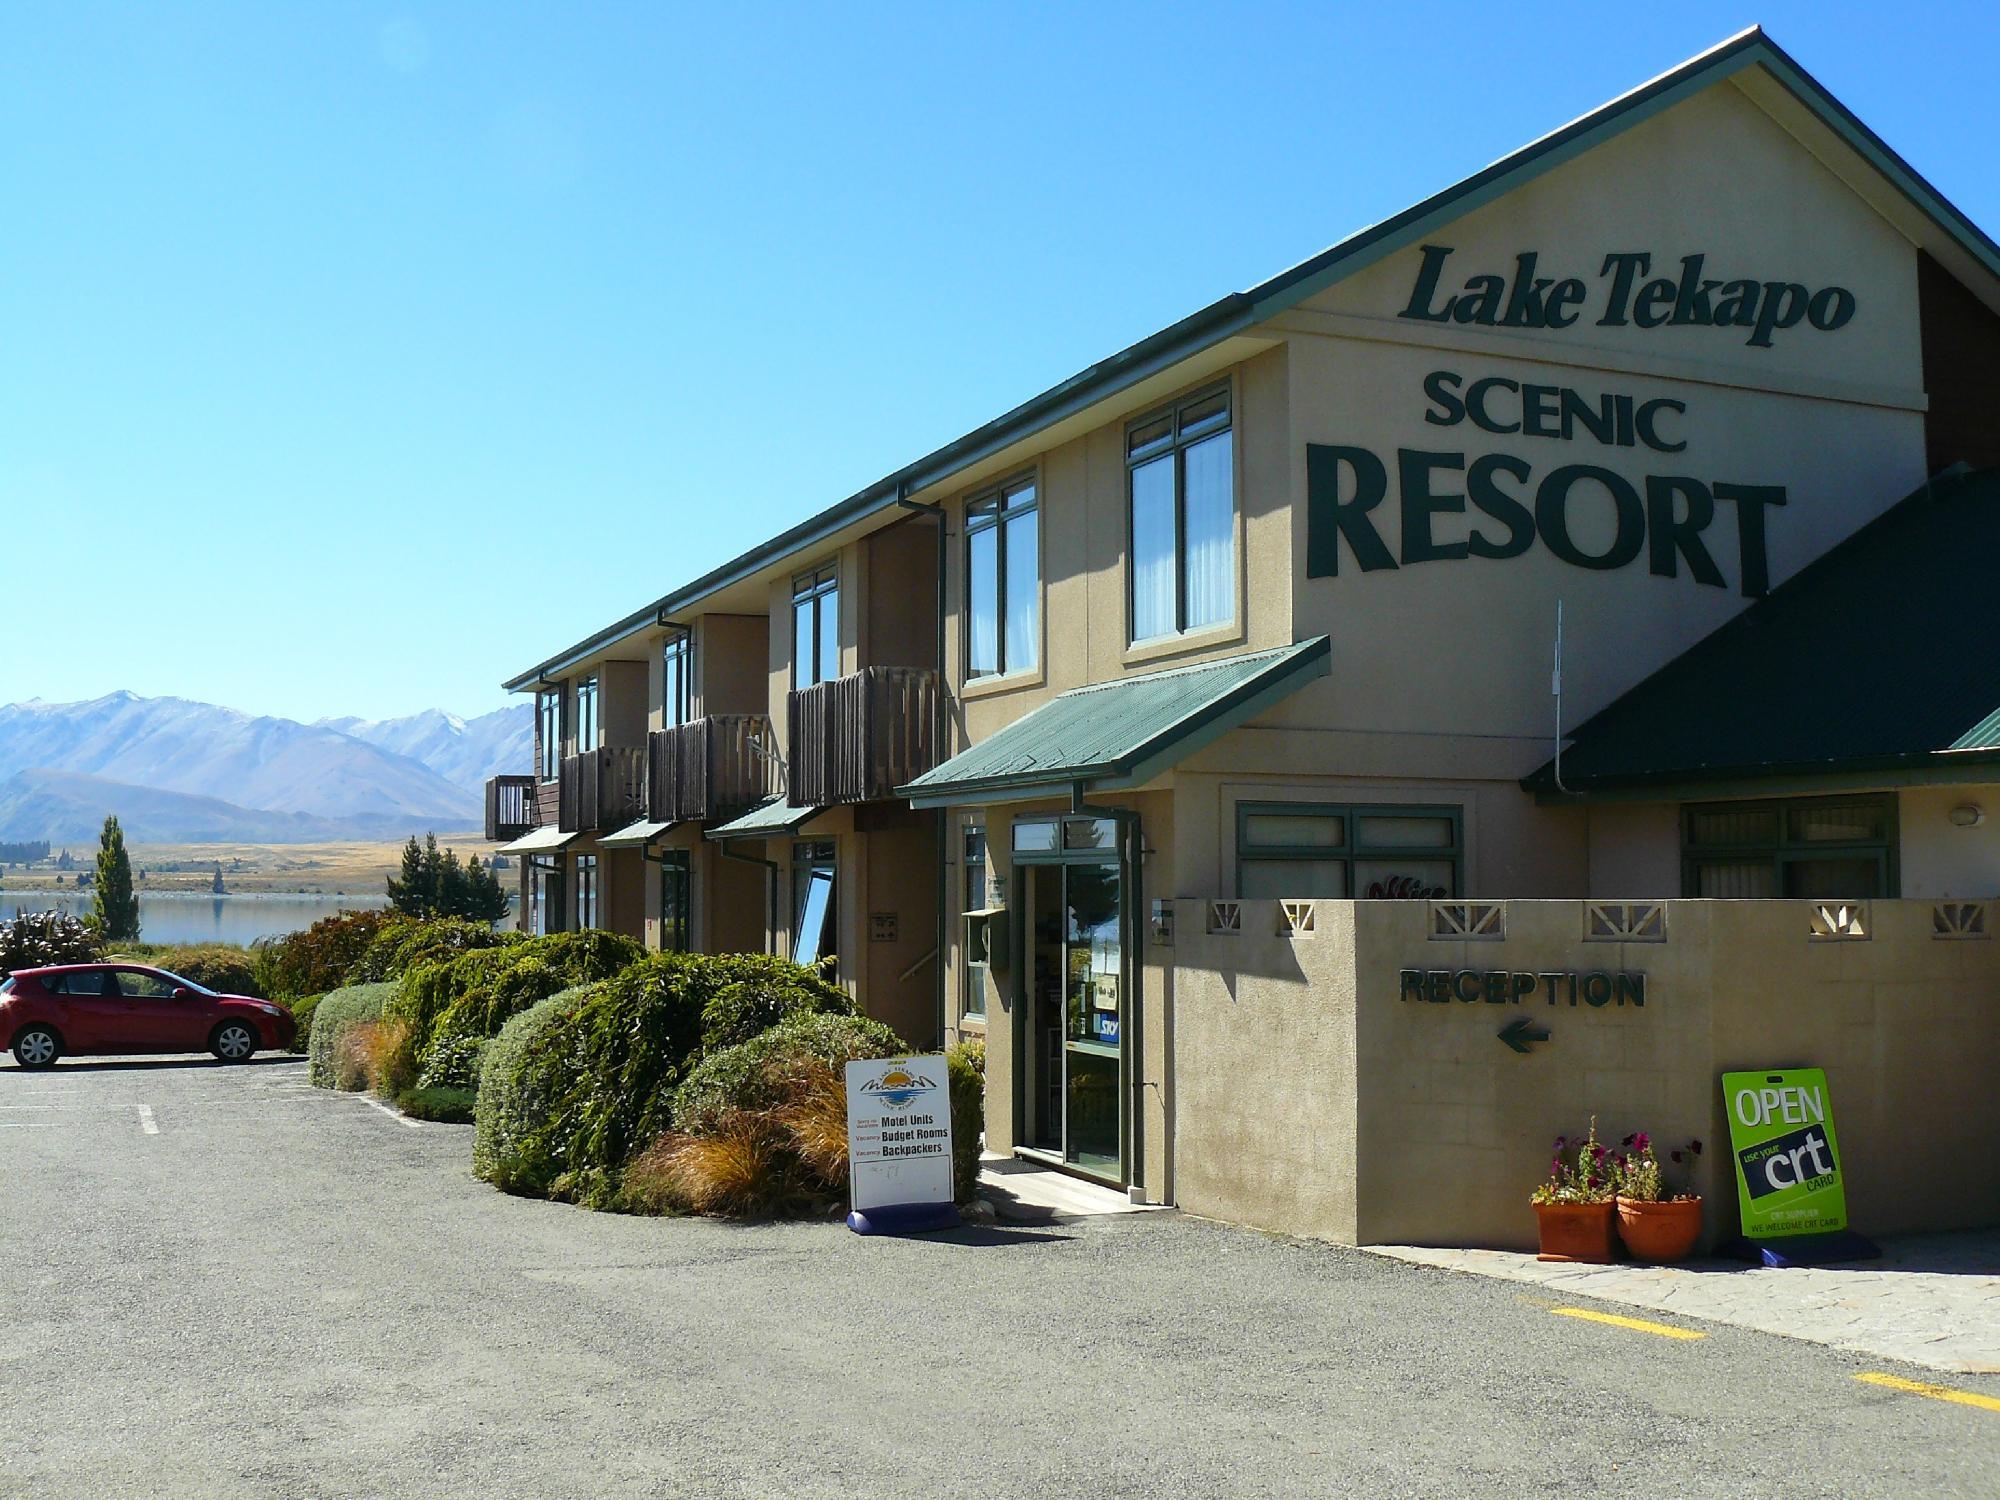 Lake Tekapo Scenic Resort